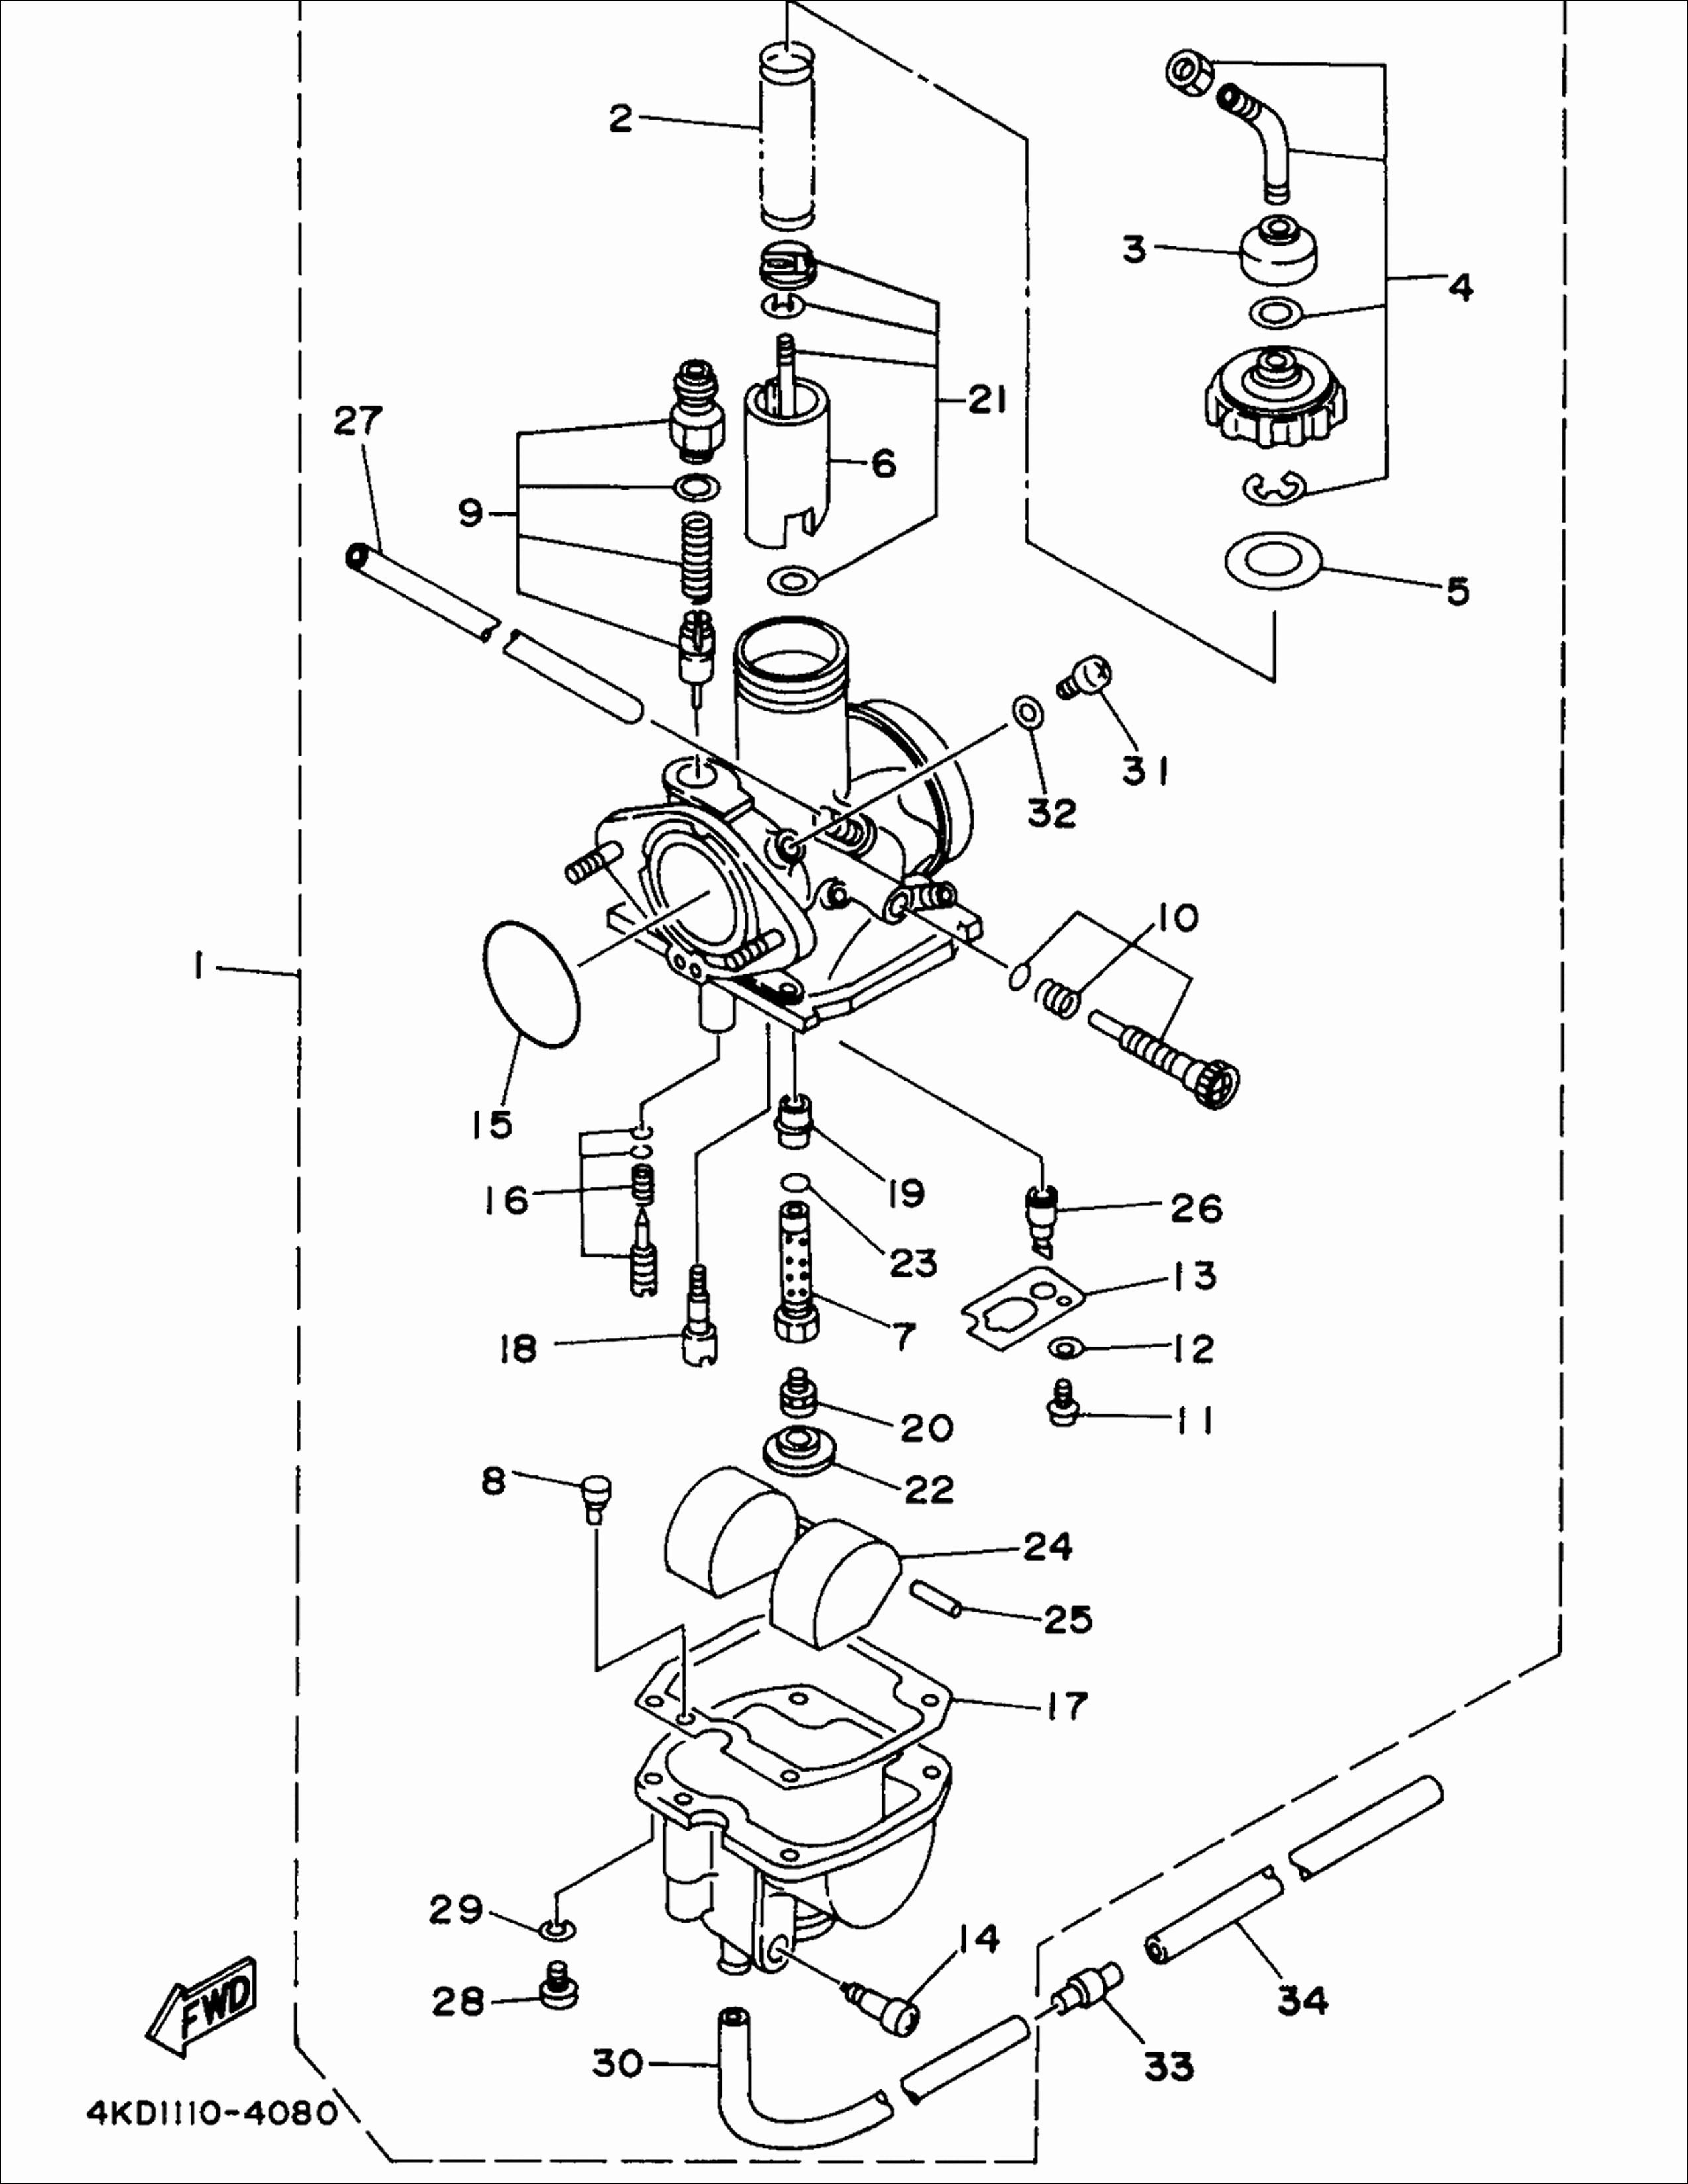 Yamaha Kodiak 400 Wiring Diagram / 1995 Yamaha Kodiak 400